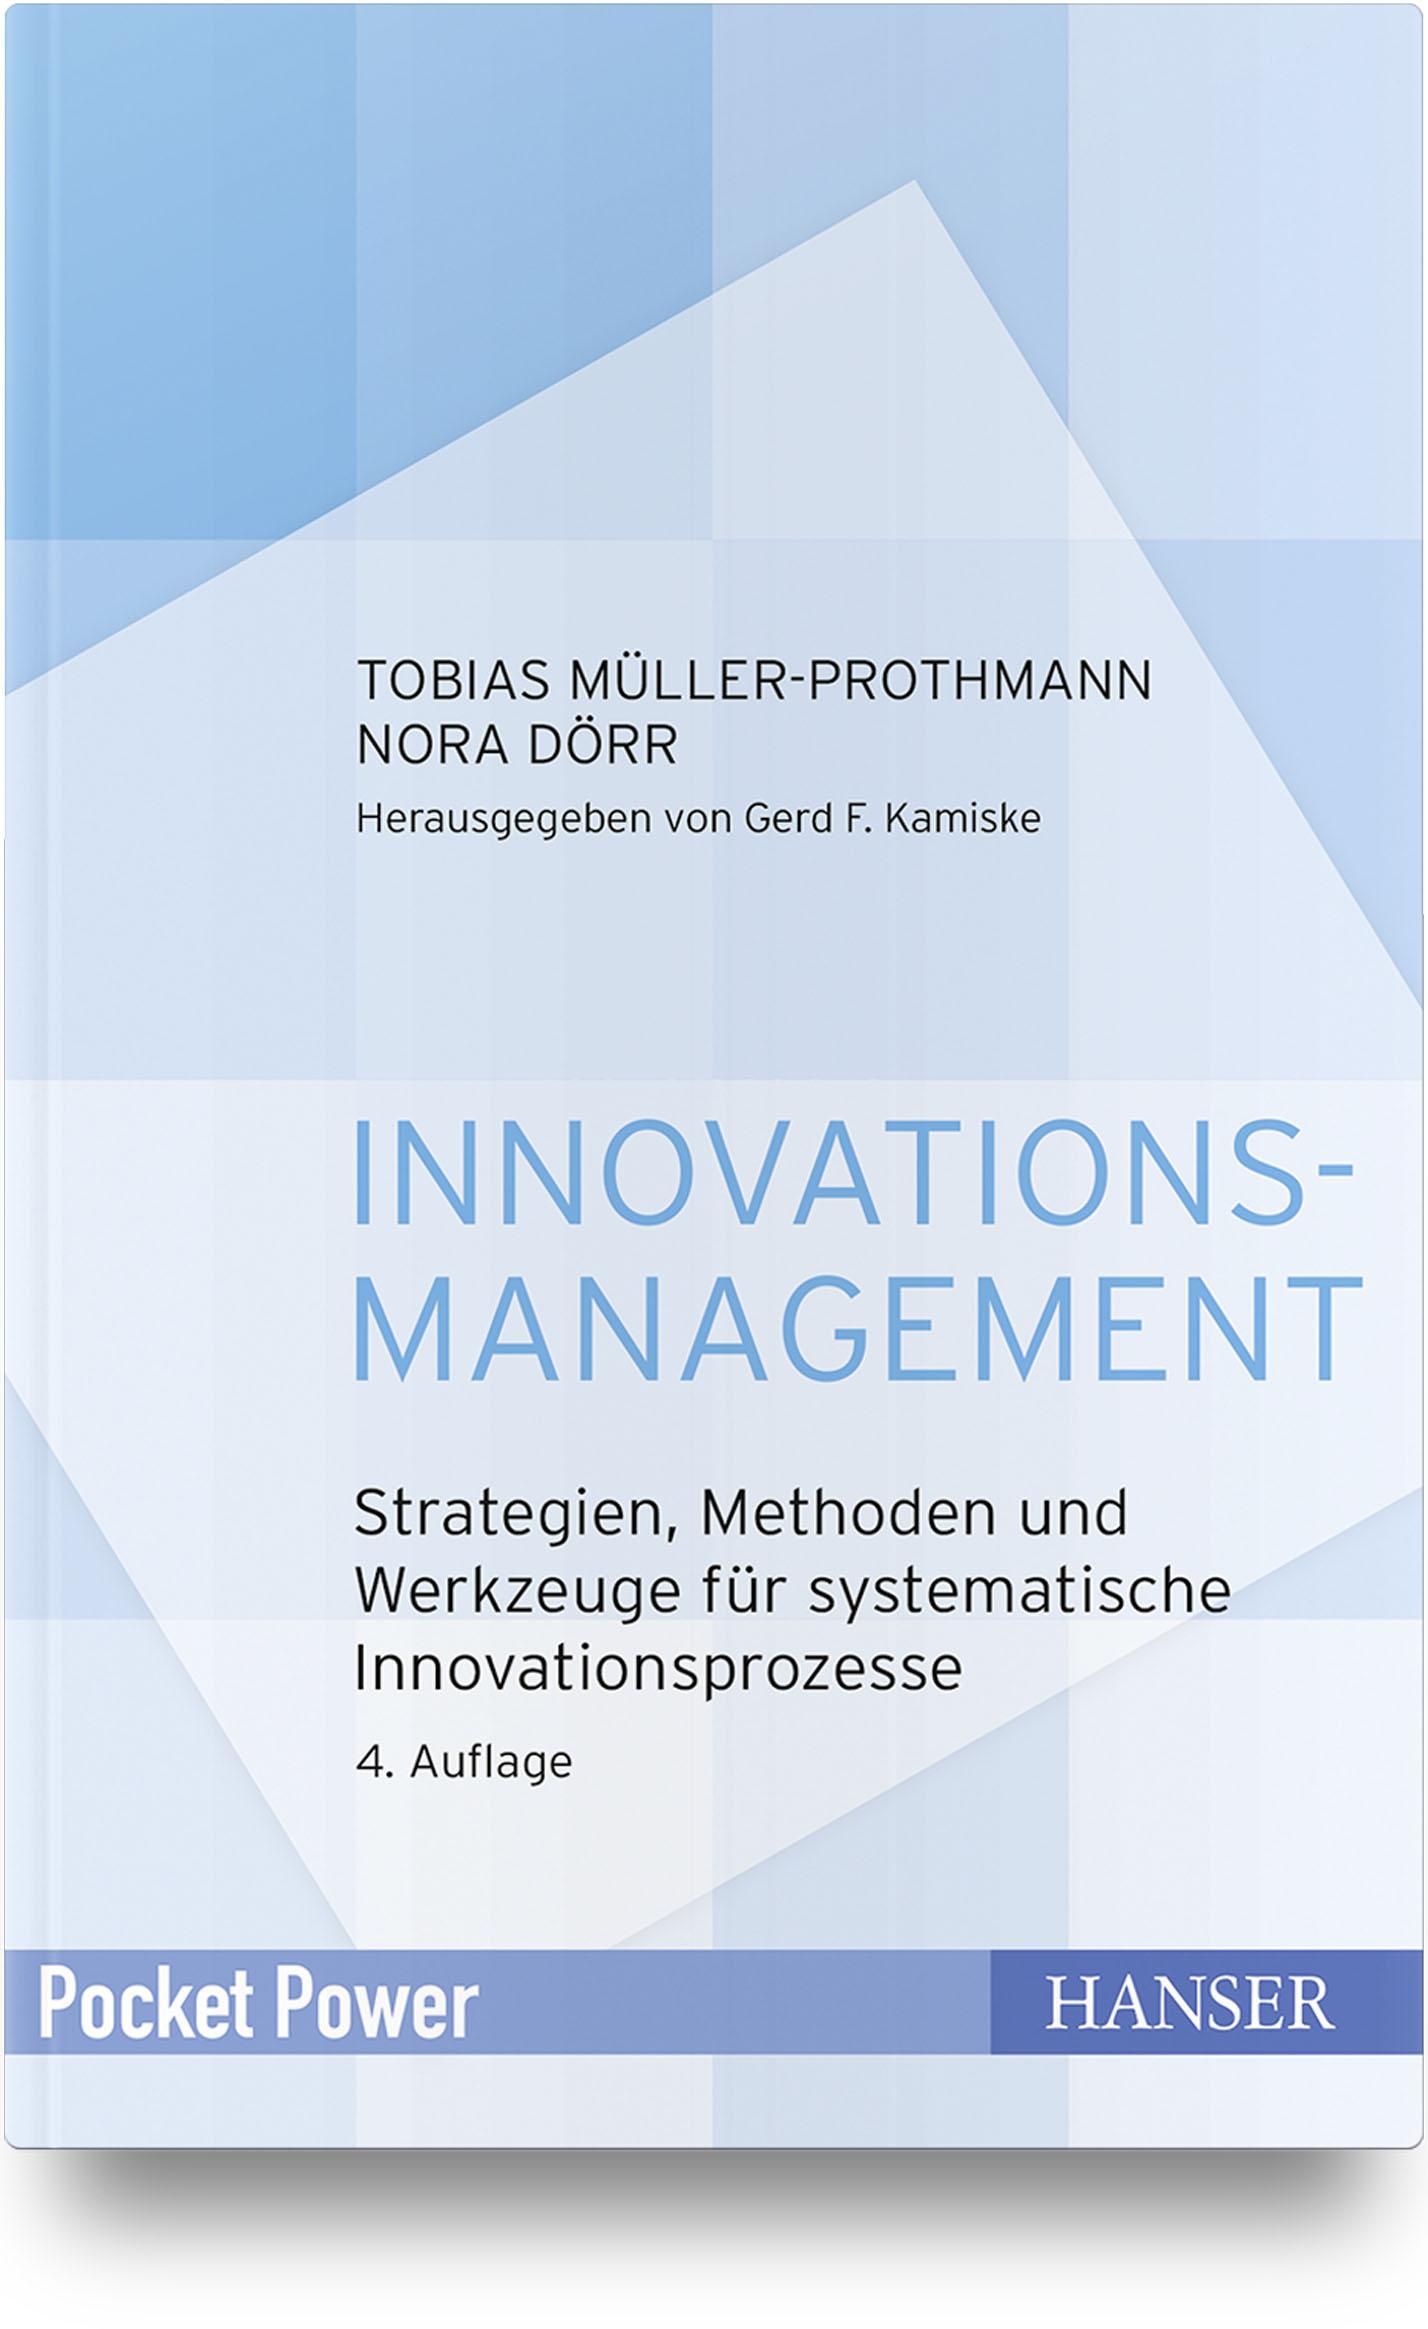 Müller-Prothmann, Dörr, Innovationsmanagement, 978-3-446-46142-0